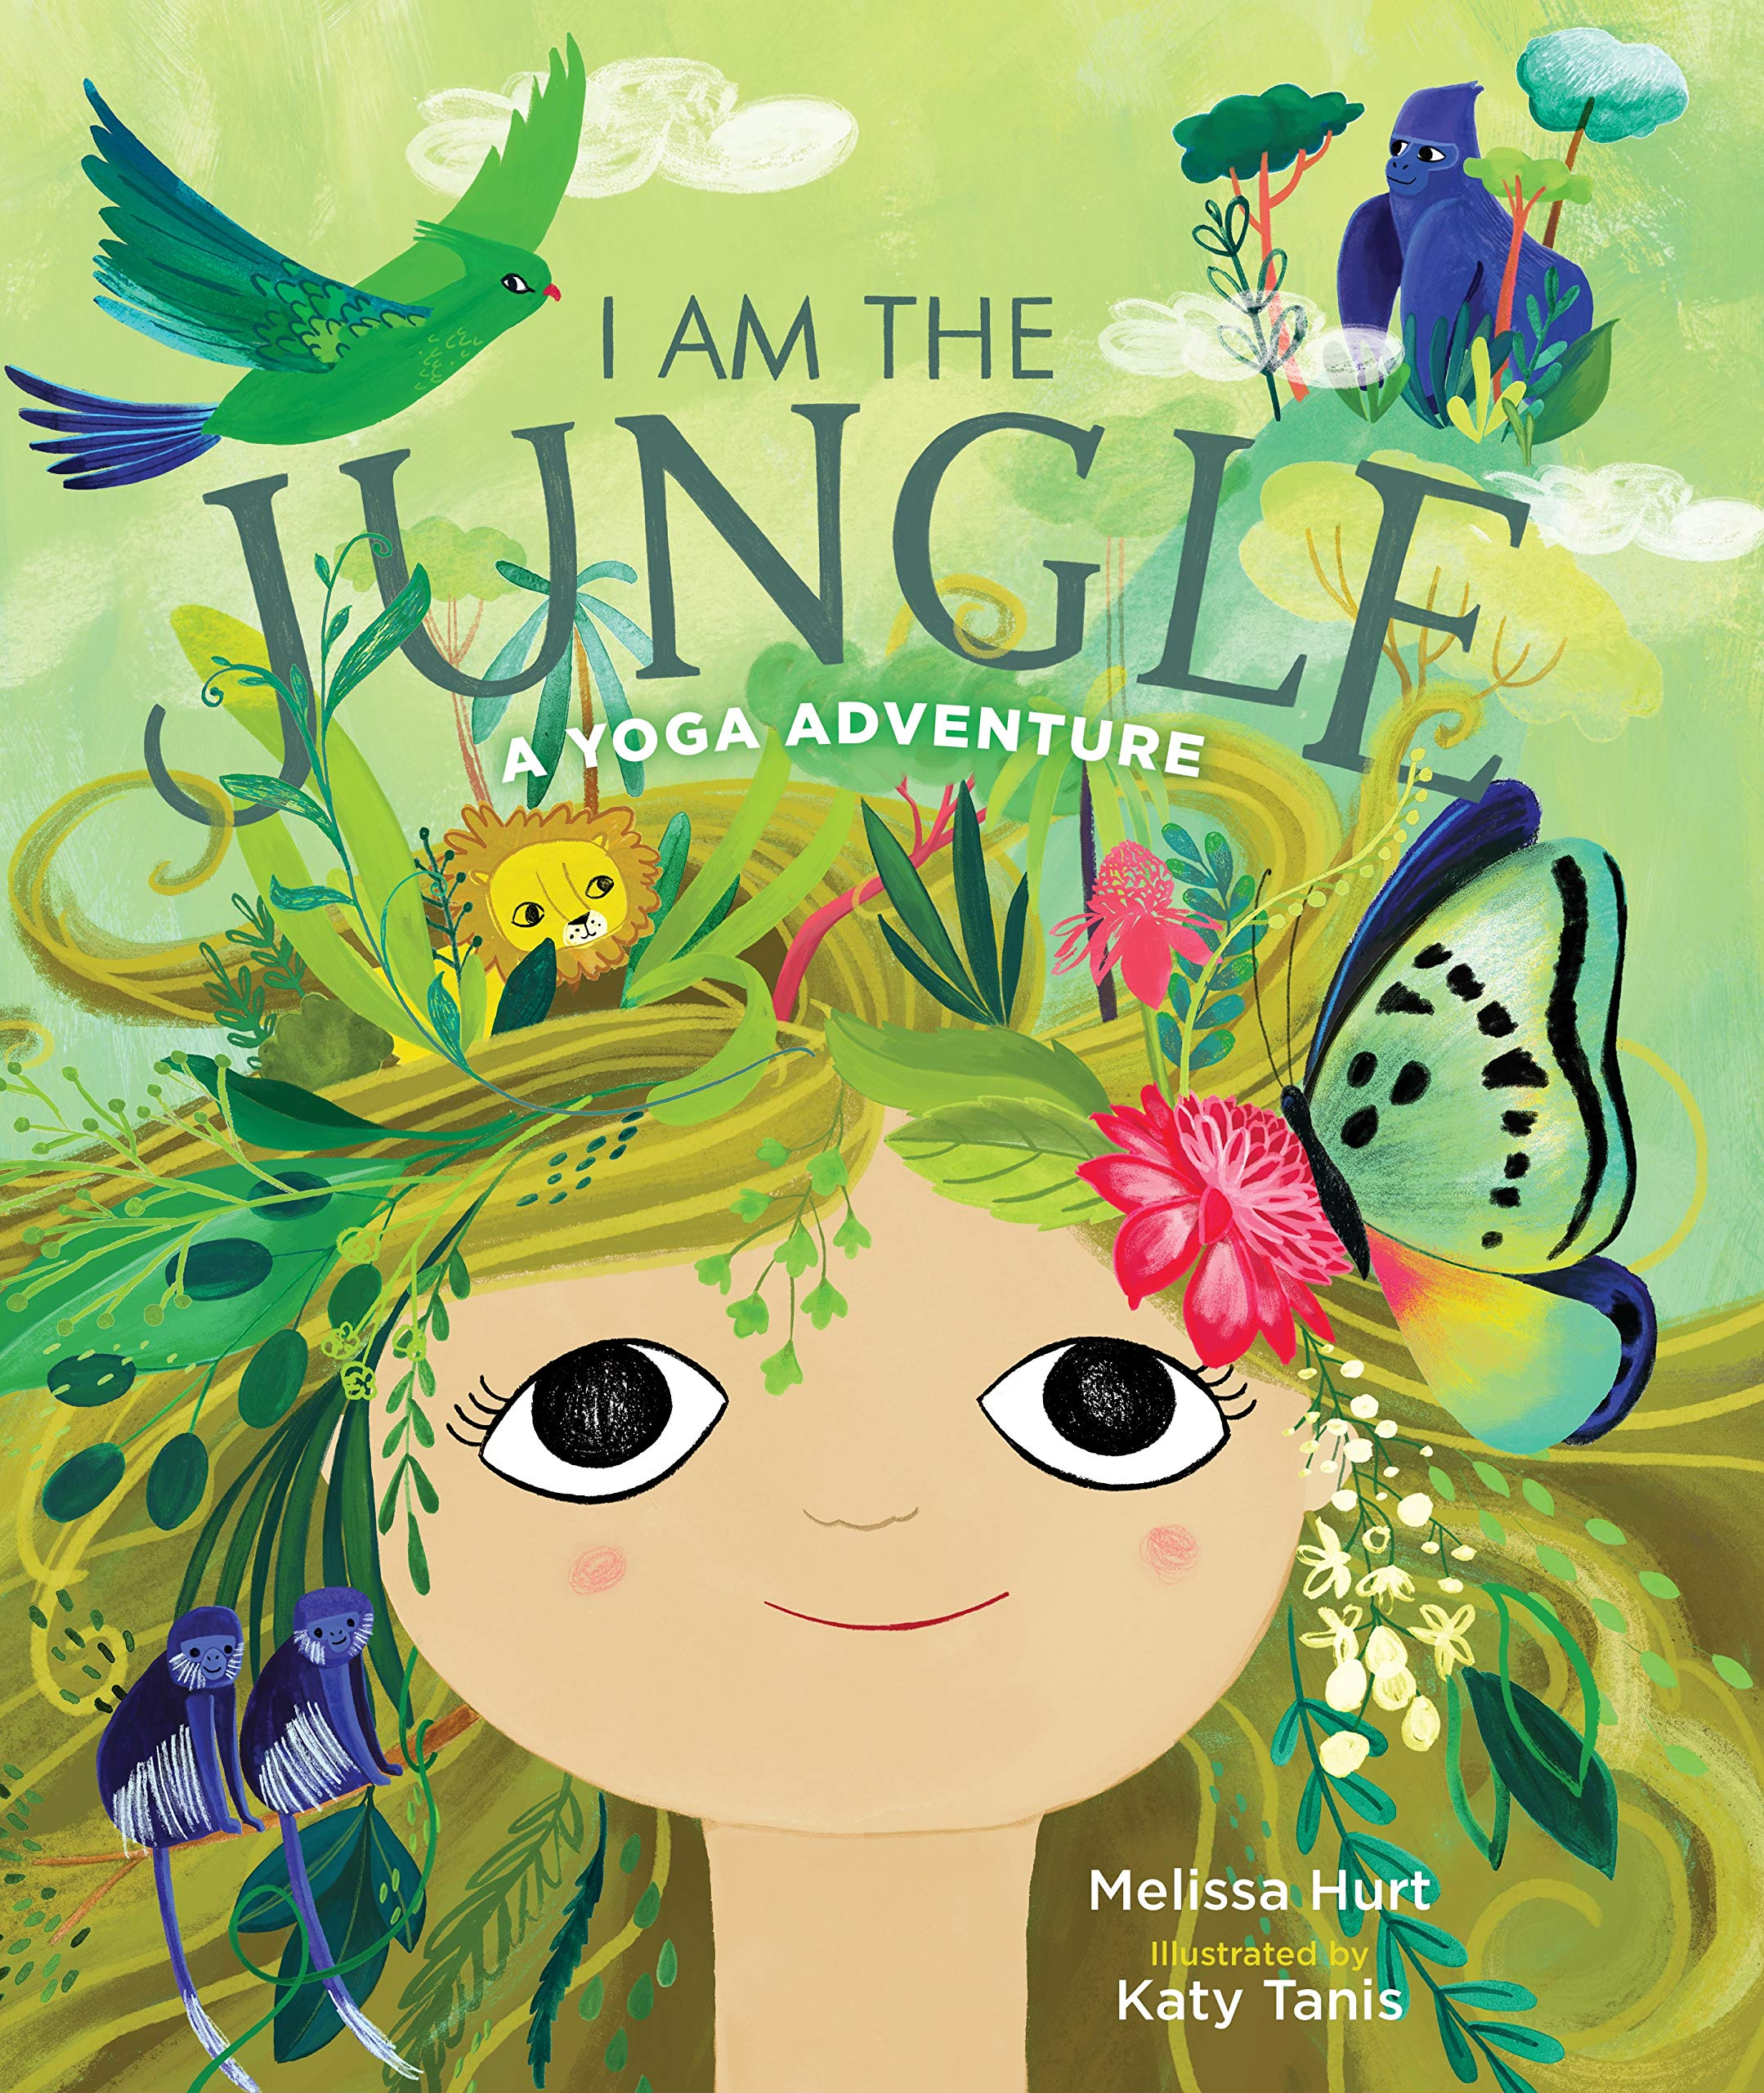 I Am the Jungle: A Yoga Adventure: Hurt, Melissa, Tanis, Katy:  9781683643821: Amazon.com: Books